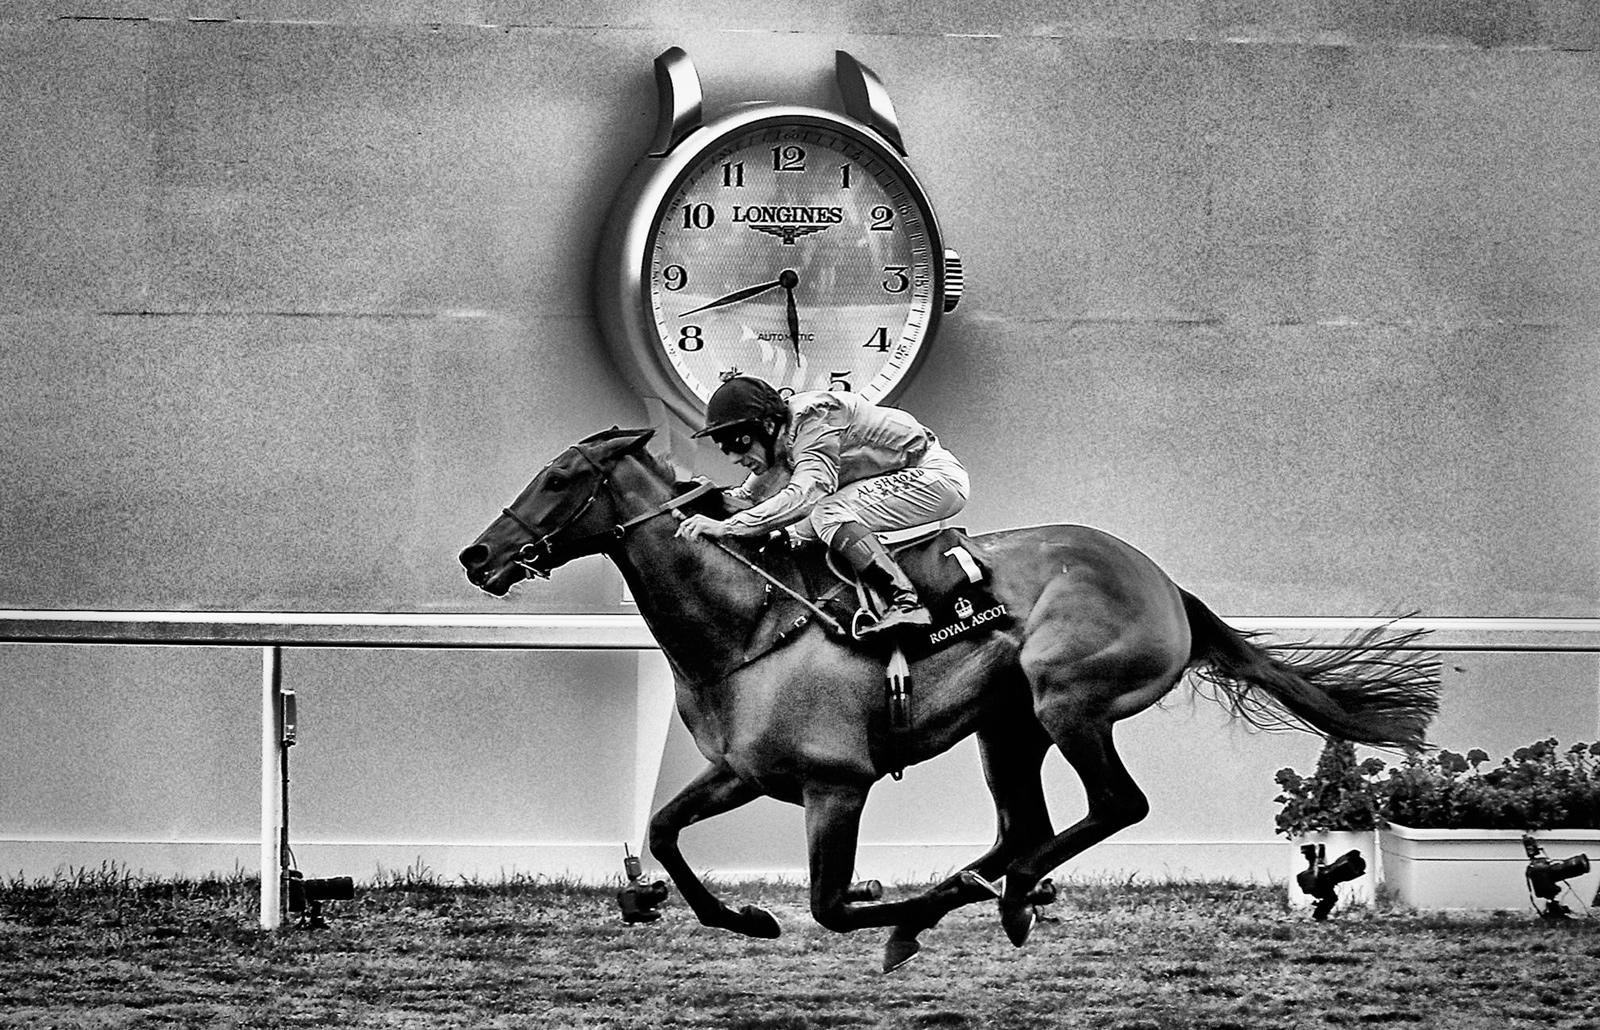 Longines World's Best Jockey